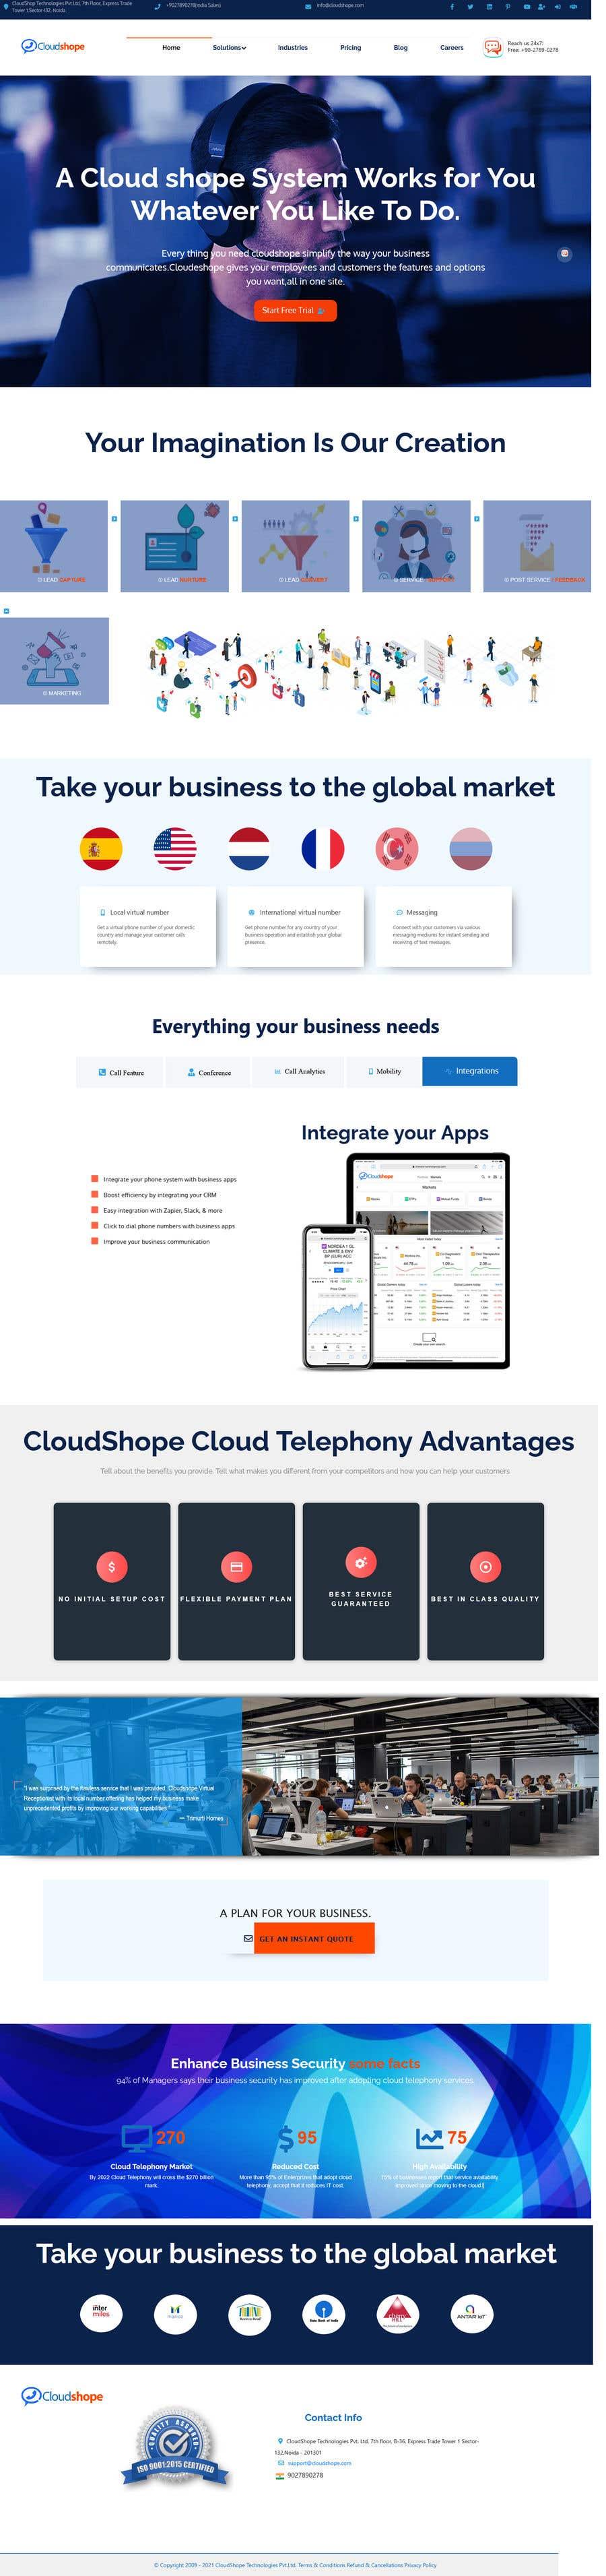 Konkurrenceindlæg #                                        18                                      for                                         Build Excellent Front Page Of our website - 14/05/2021 12:47 EDT